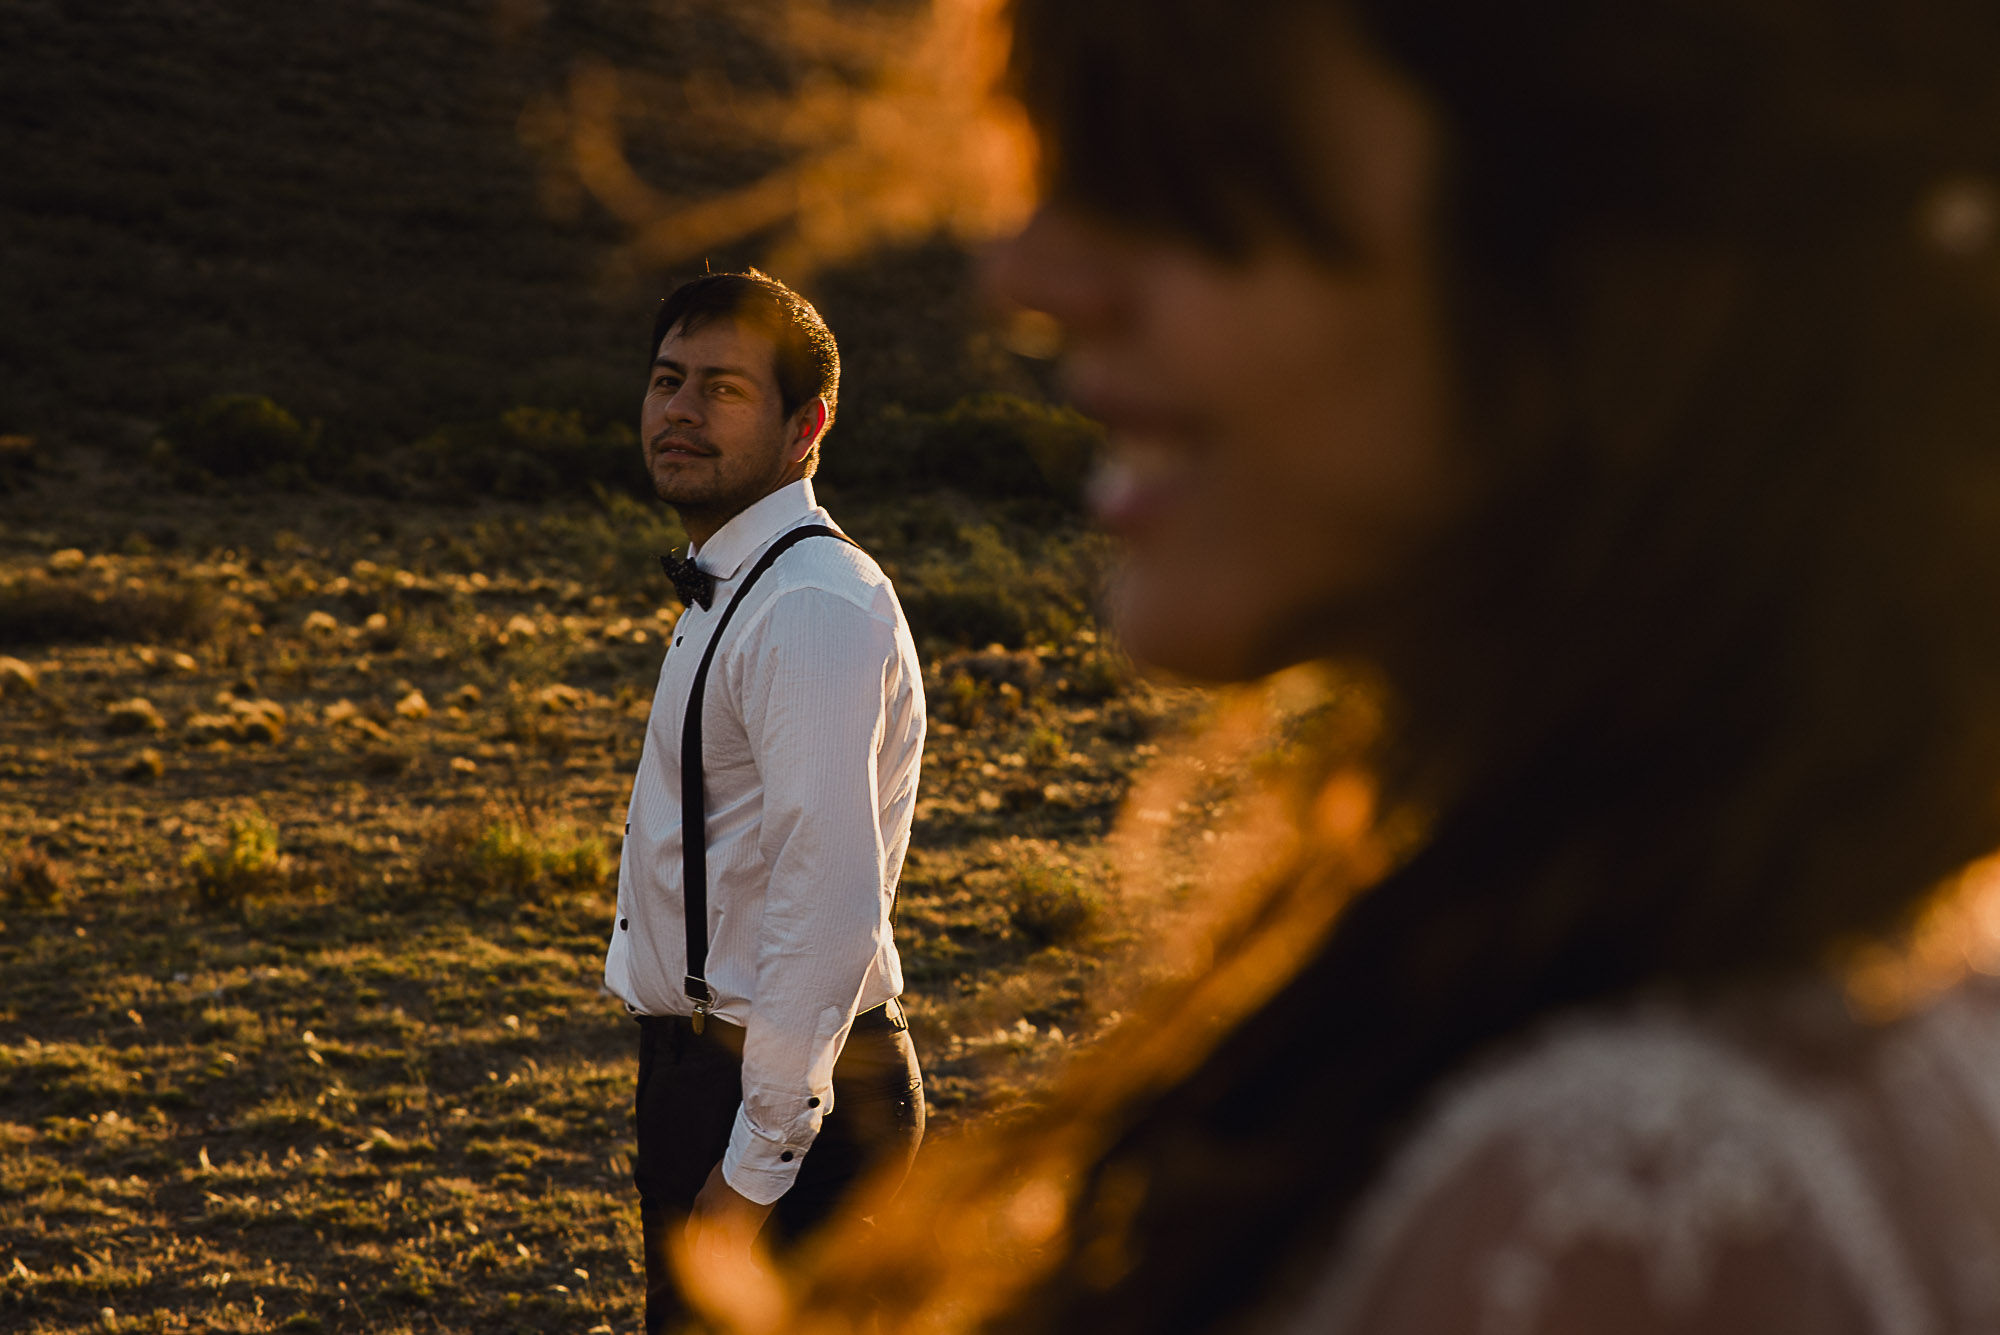 post-boda-trash-the-dress-marifer-y-felix-fotografia-de-bodas-en-patagonia-gabriel-roa-photography-15